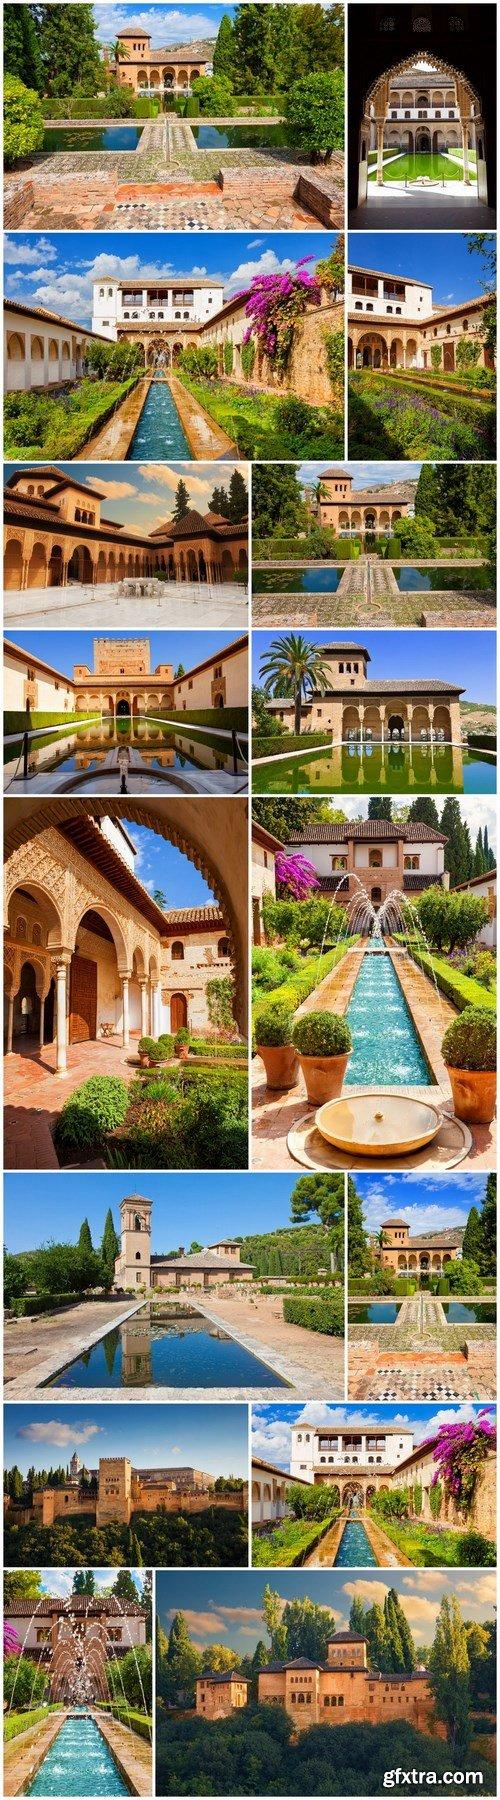 Beauty of Alhambra de Granada - 16xUHQ JPEG Photo Stock